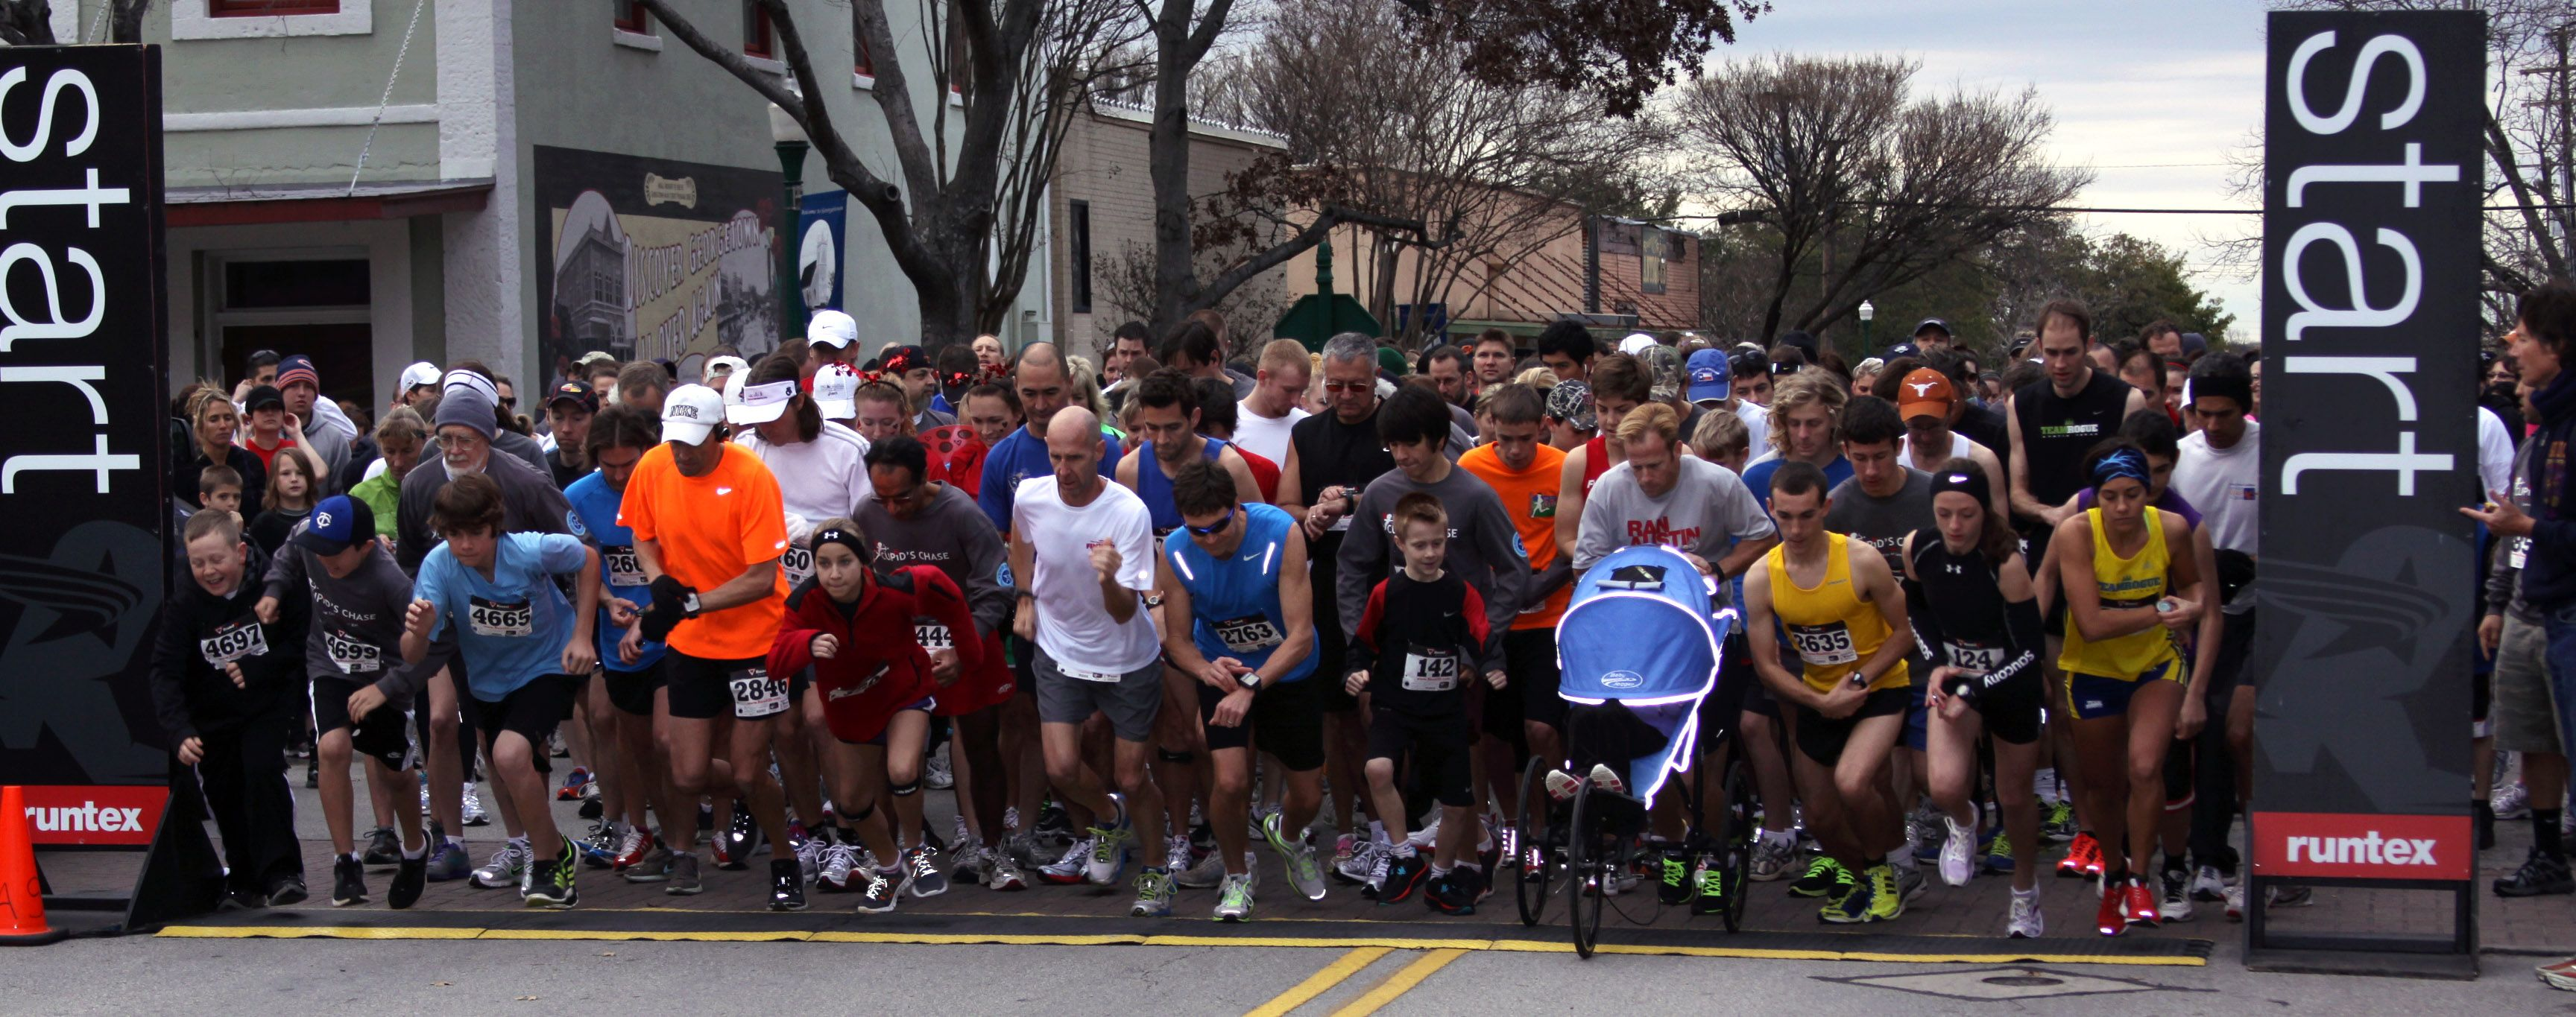 The first race! 2014 Cupid's Chase 5k Run/Walk & Kid's Fun Run, benefiting Georgetown Parks & Recreation #runforcharity #fundraise #charity #charitymiles #run #running #helpingout #gofundme #5k #everymilematters #runkat